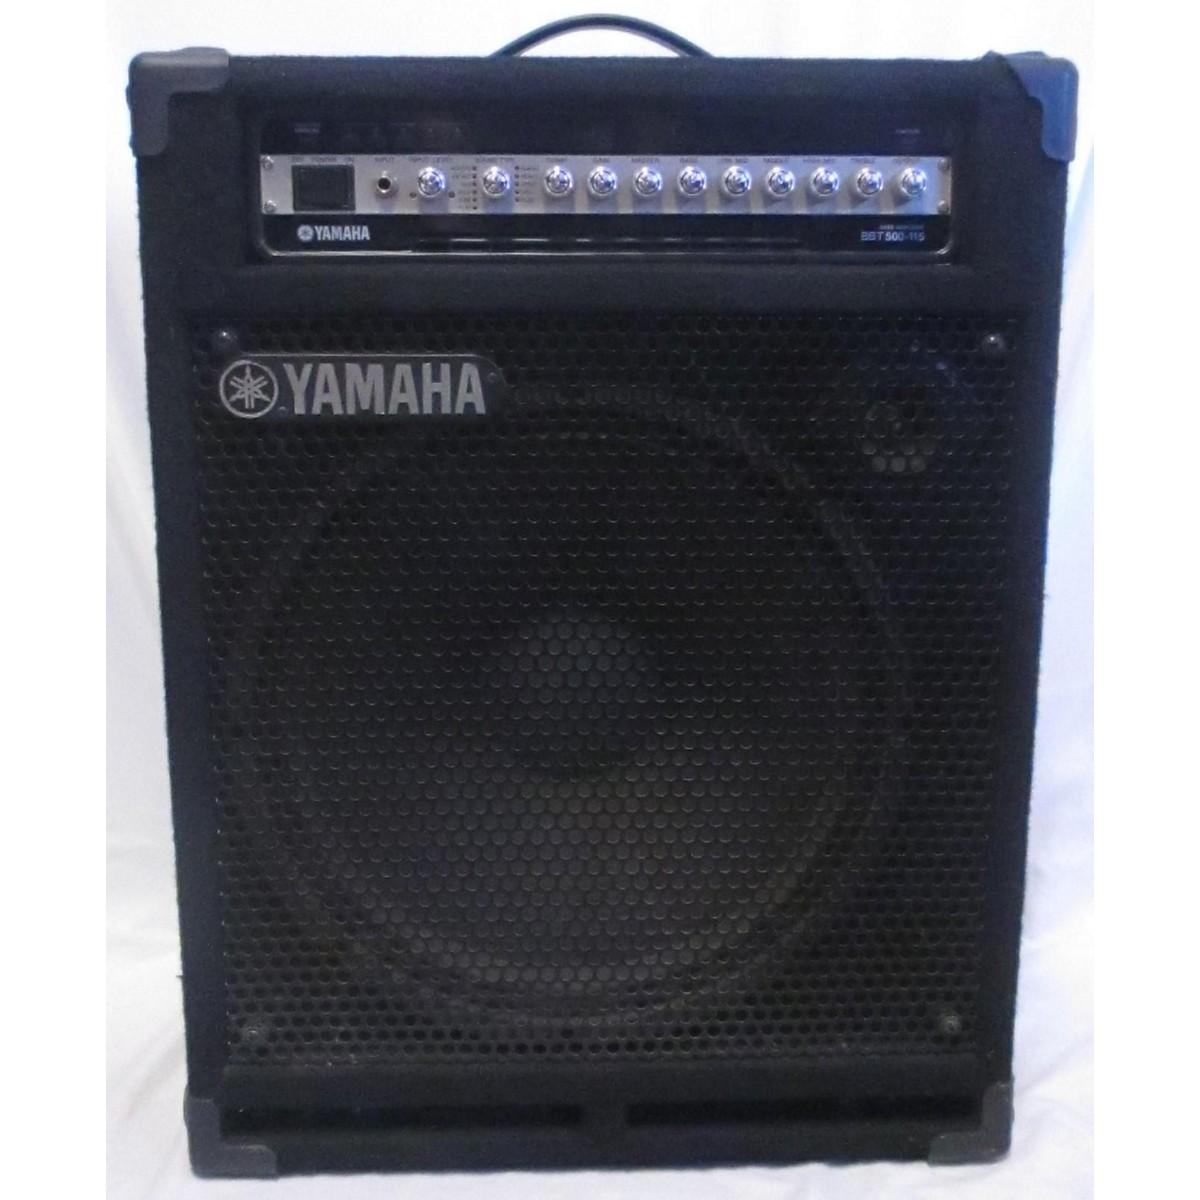 Yamaha BBT 500 115 Bass Combo Amp